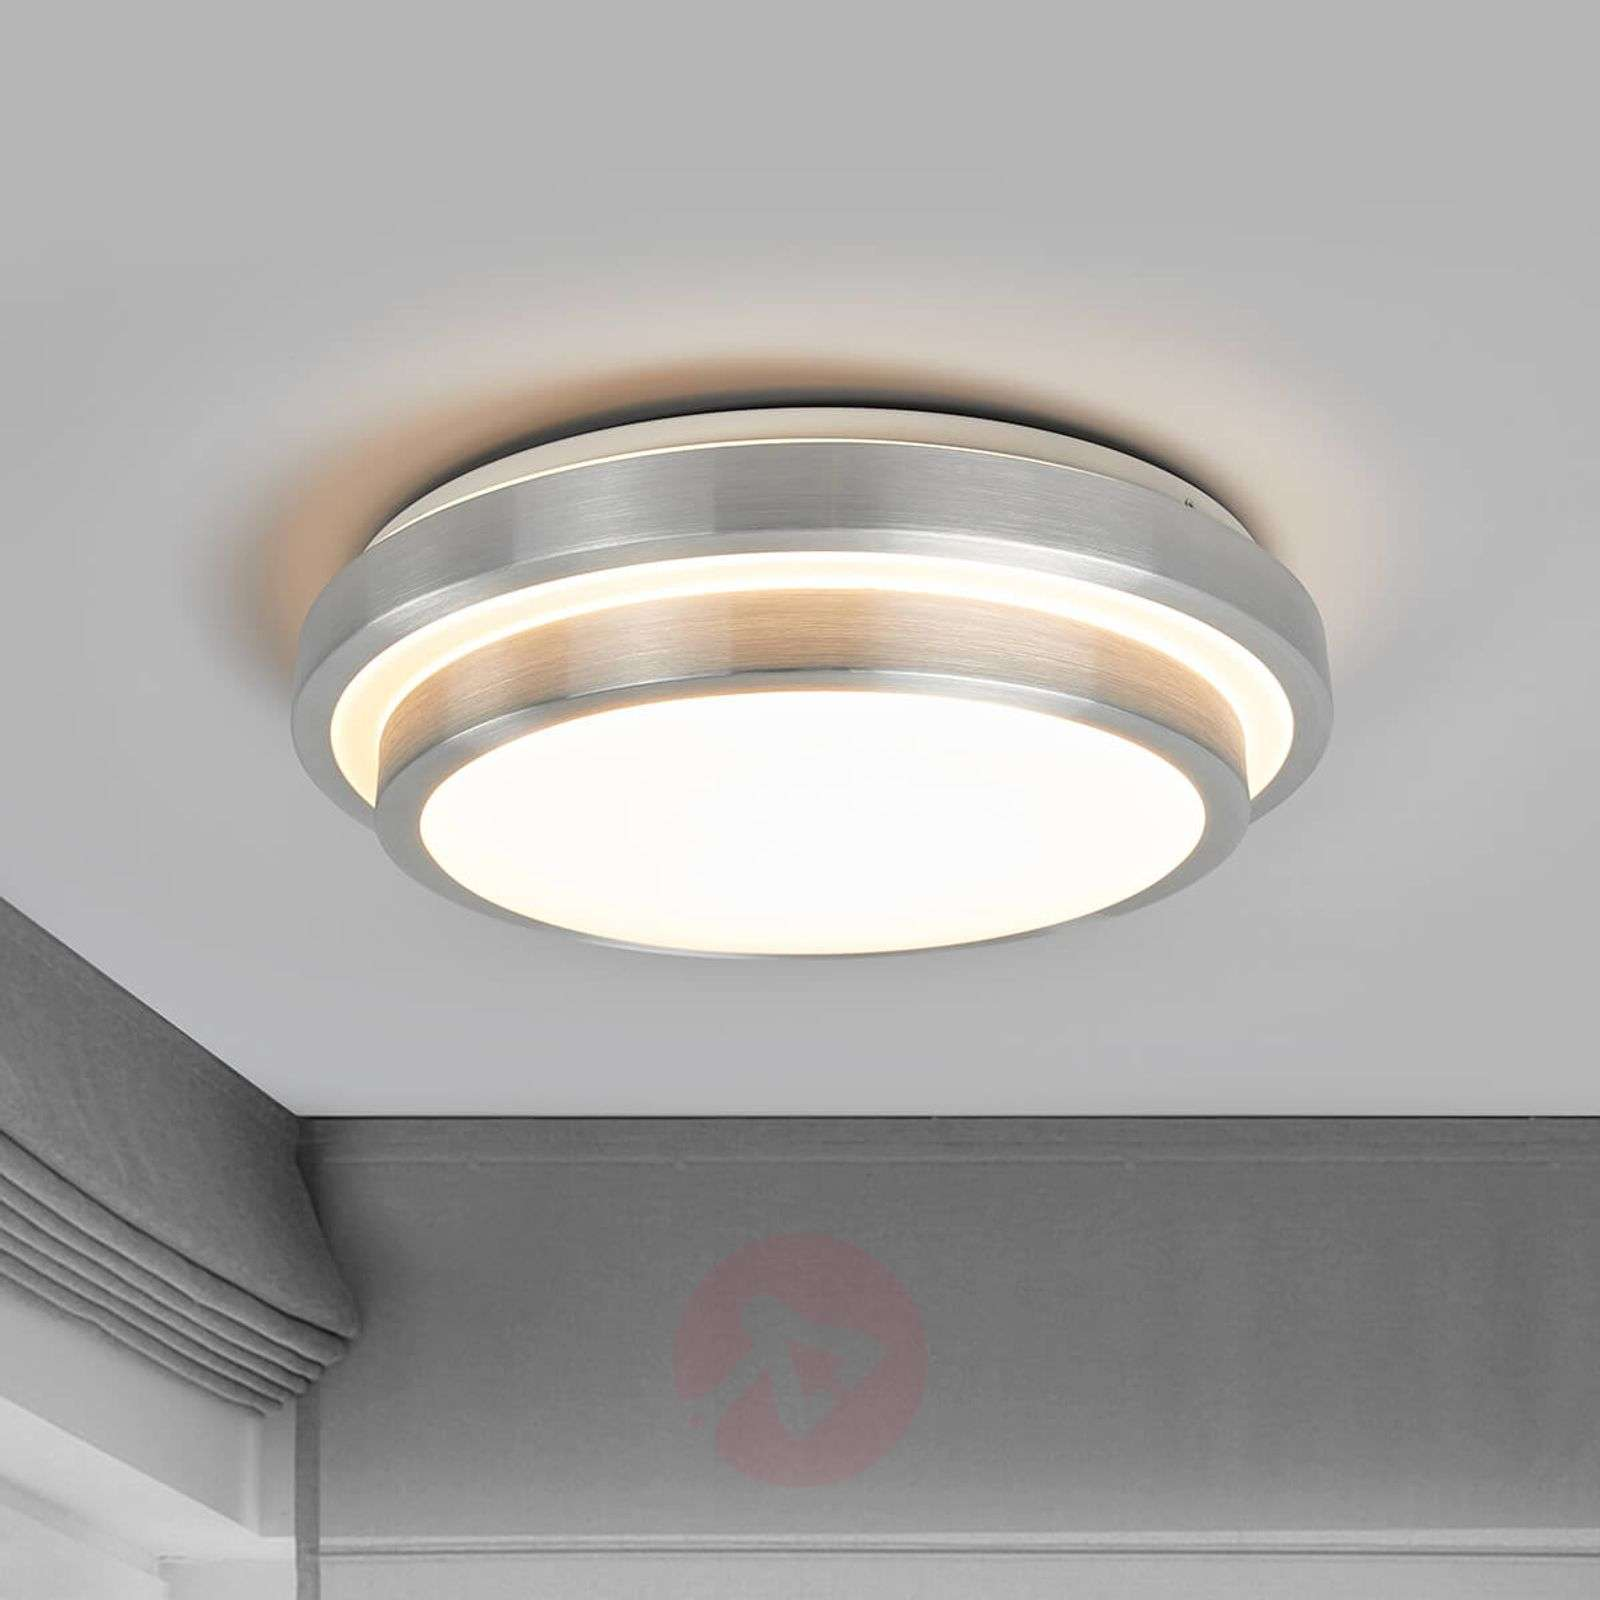 Huberta LED ceiling lamp, round, 41cm-9974028-01